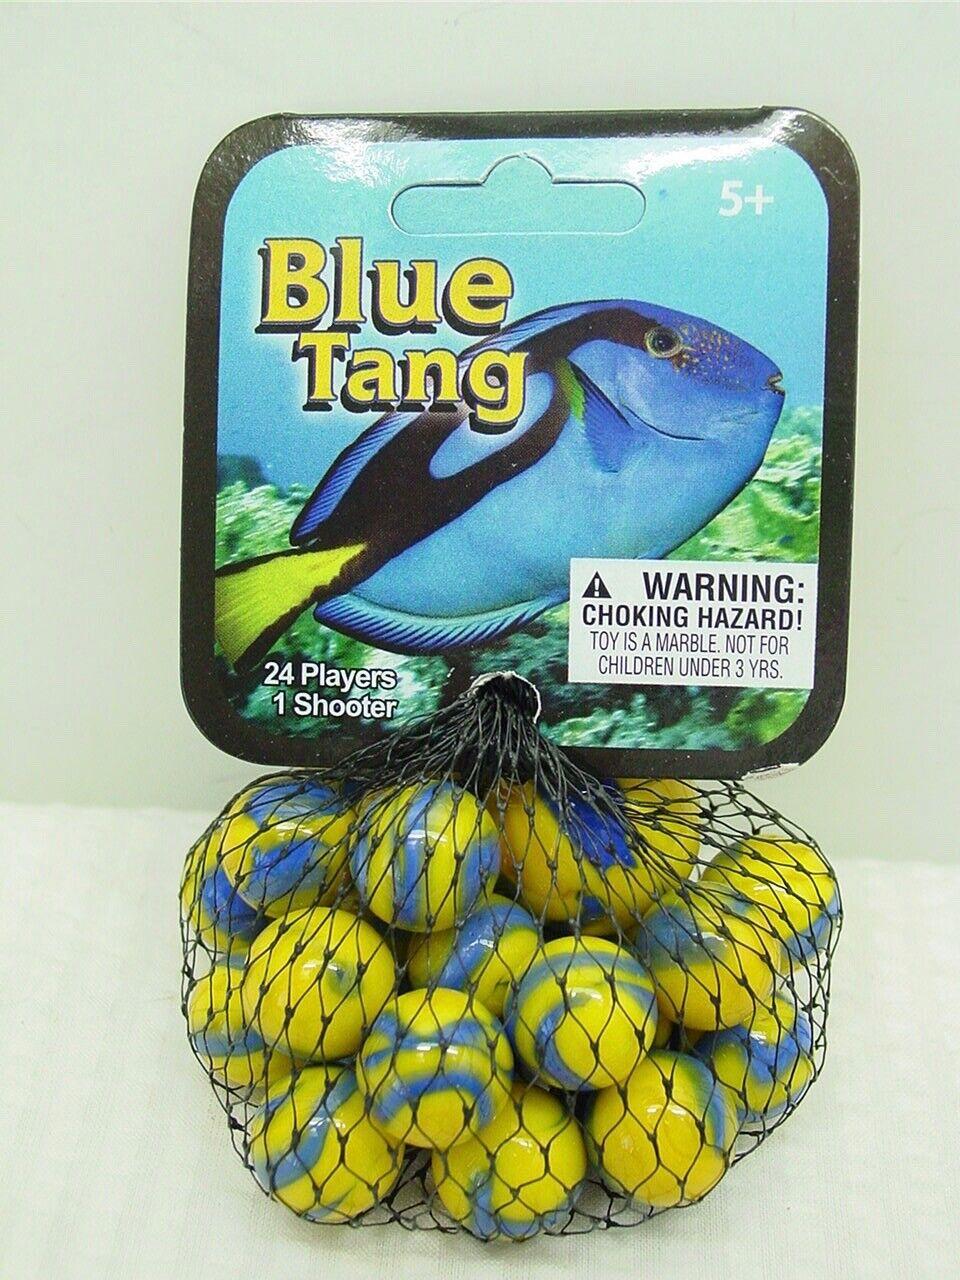 5//8/'/' Mega Marbles Themed- 24 Player Marbles 1/'/' Blue Tang Fish 1 Shooter -